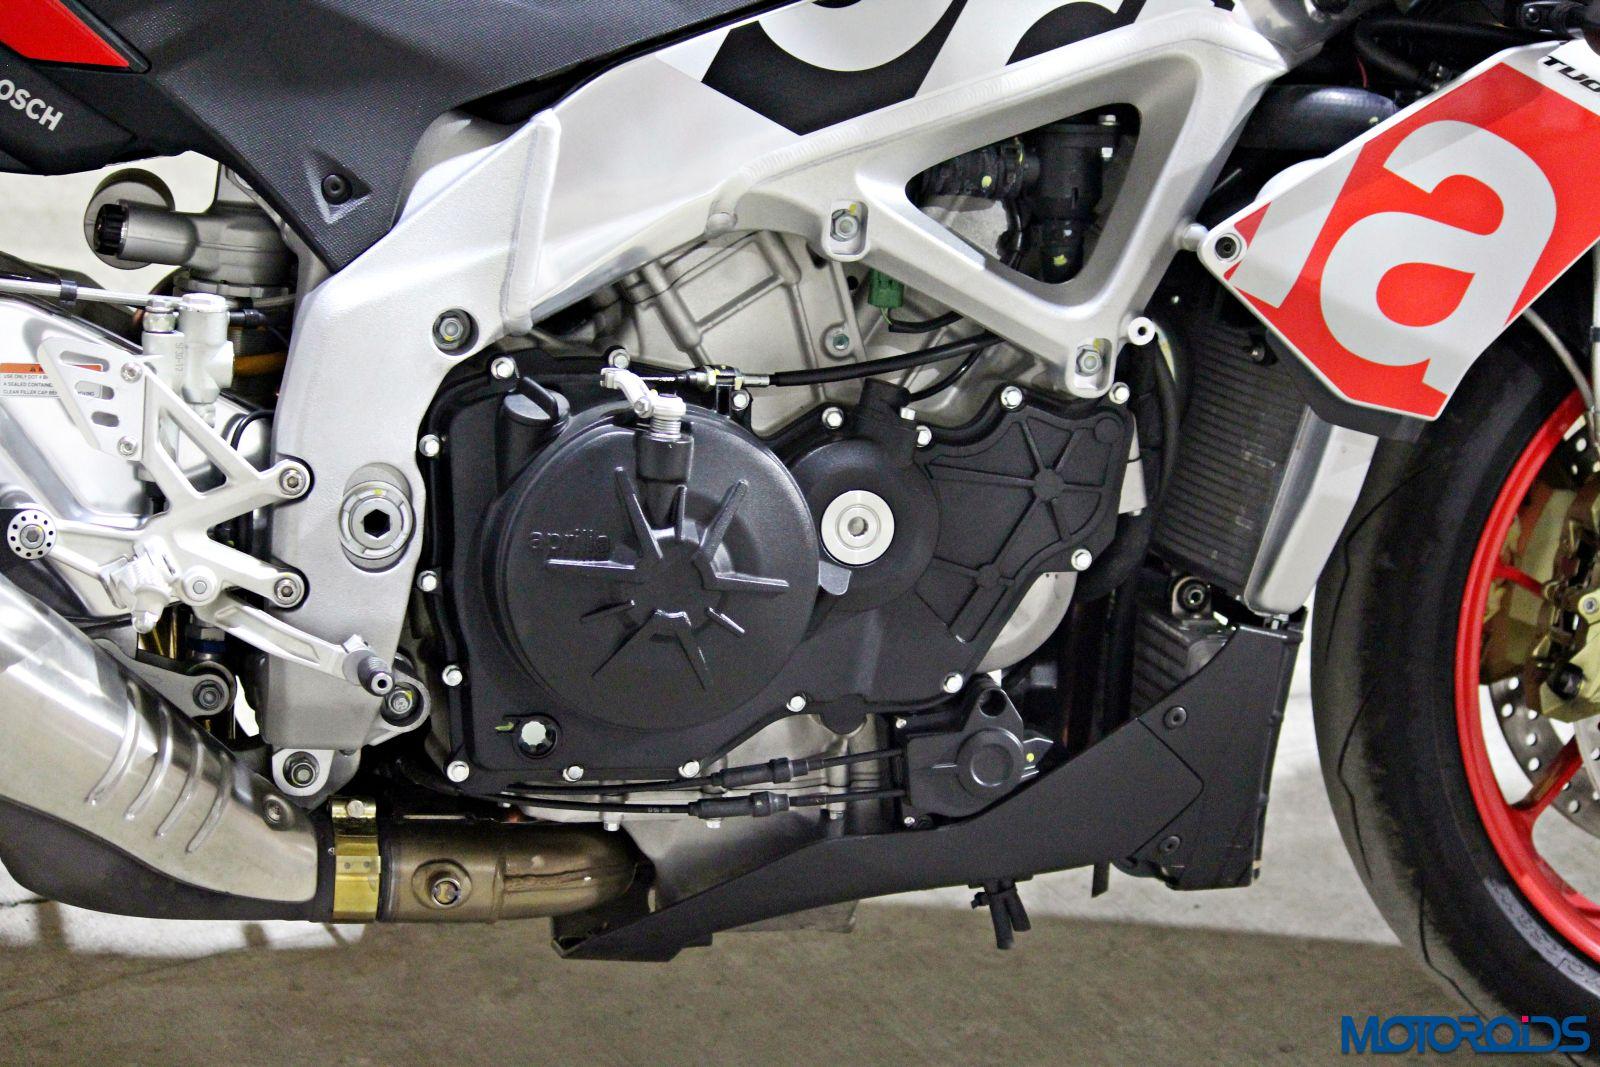 Aprilia Tuono V4 1100 Factory Review - Details and Stills (23)